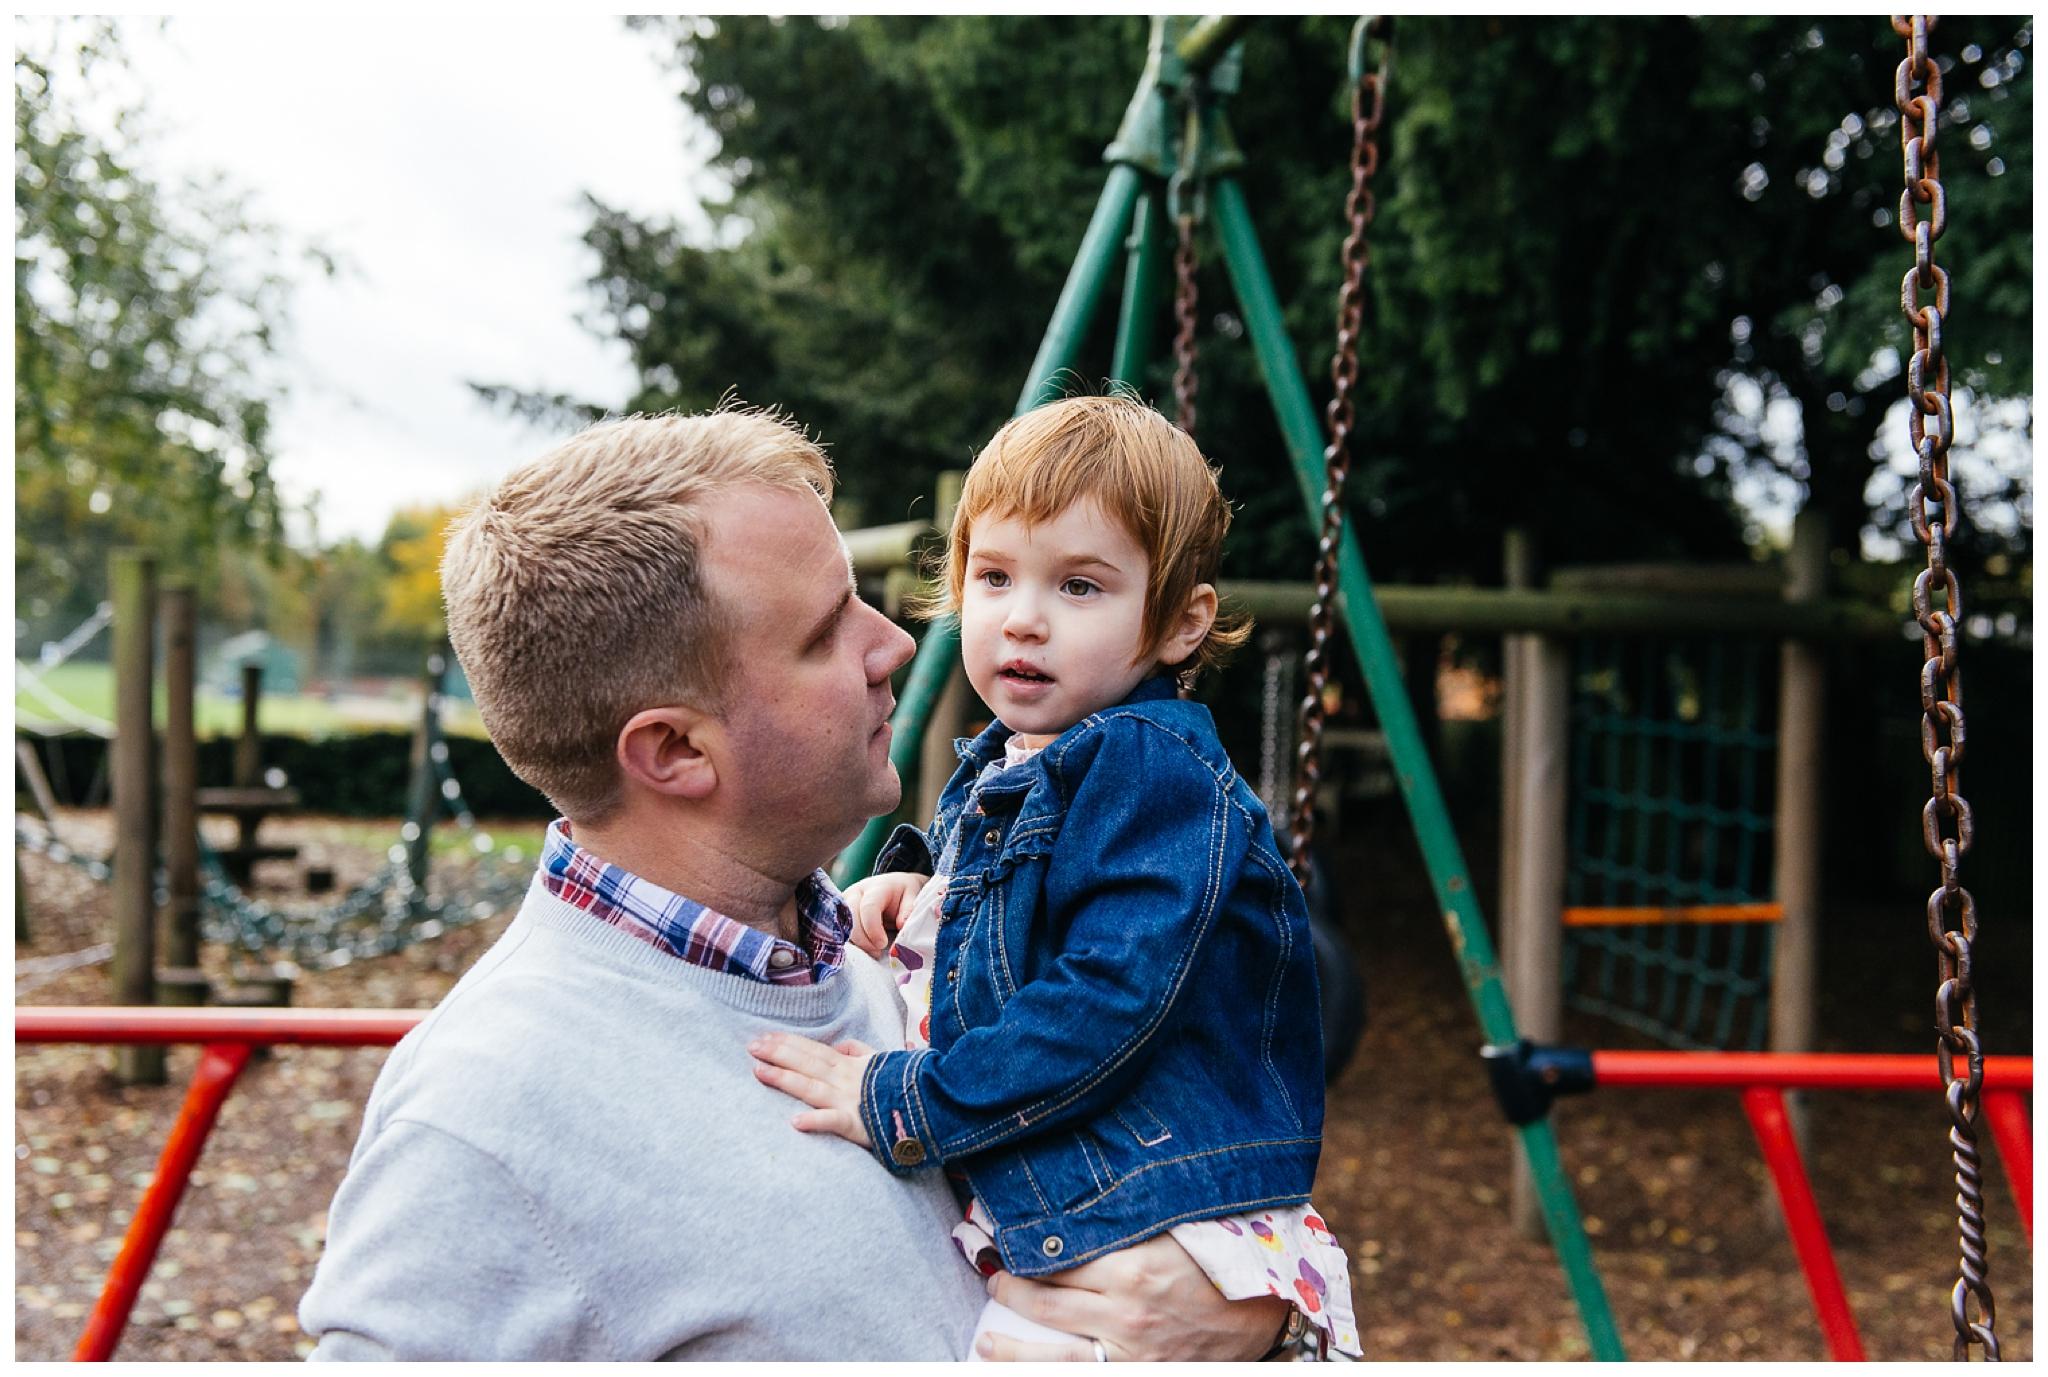 Autumn-family-portraits-birmingham-photographer_0004.jpg